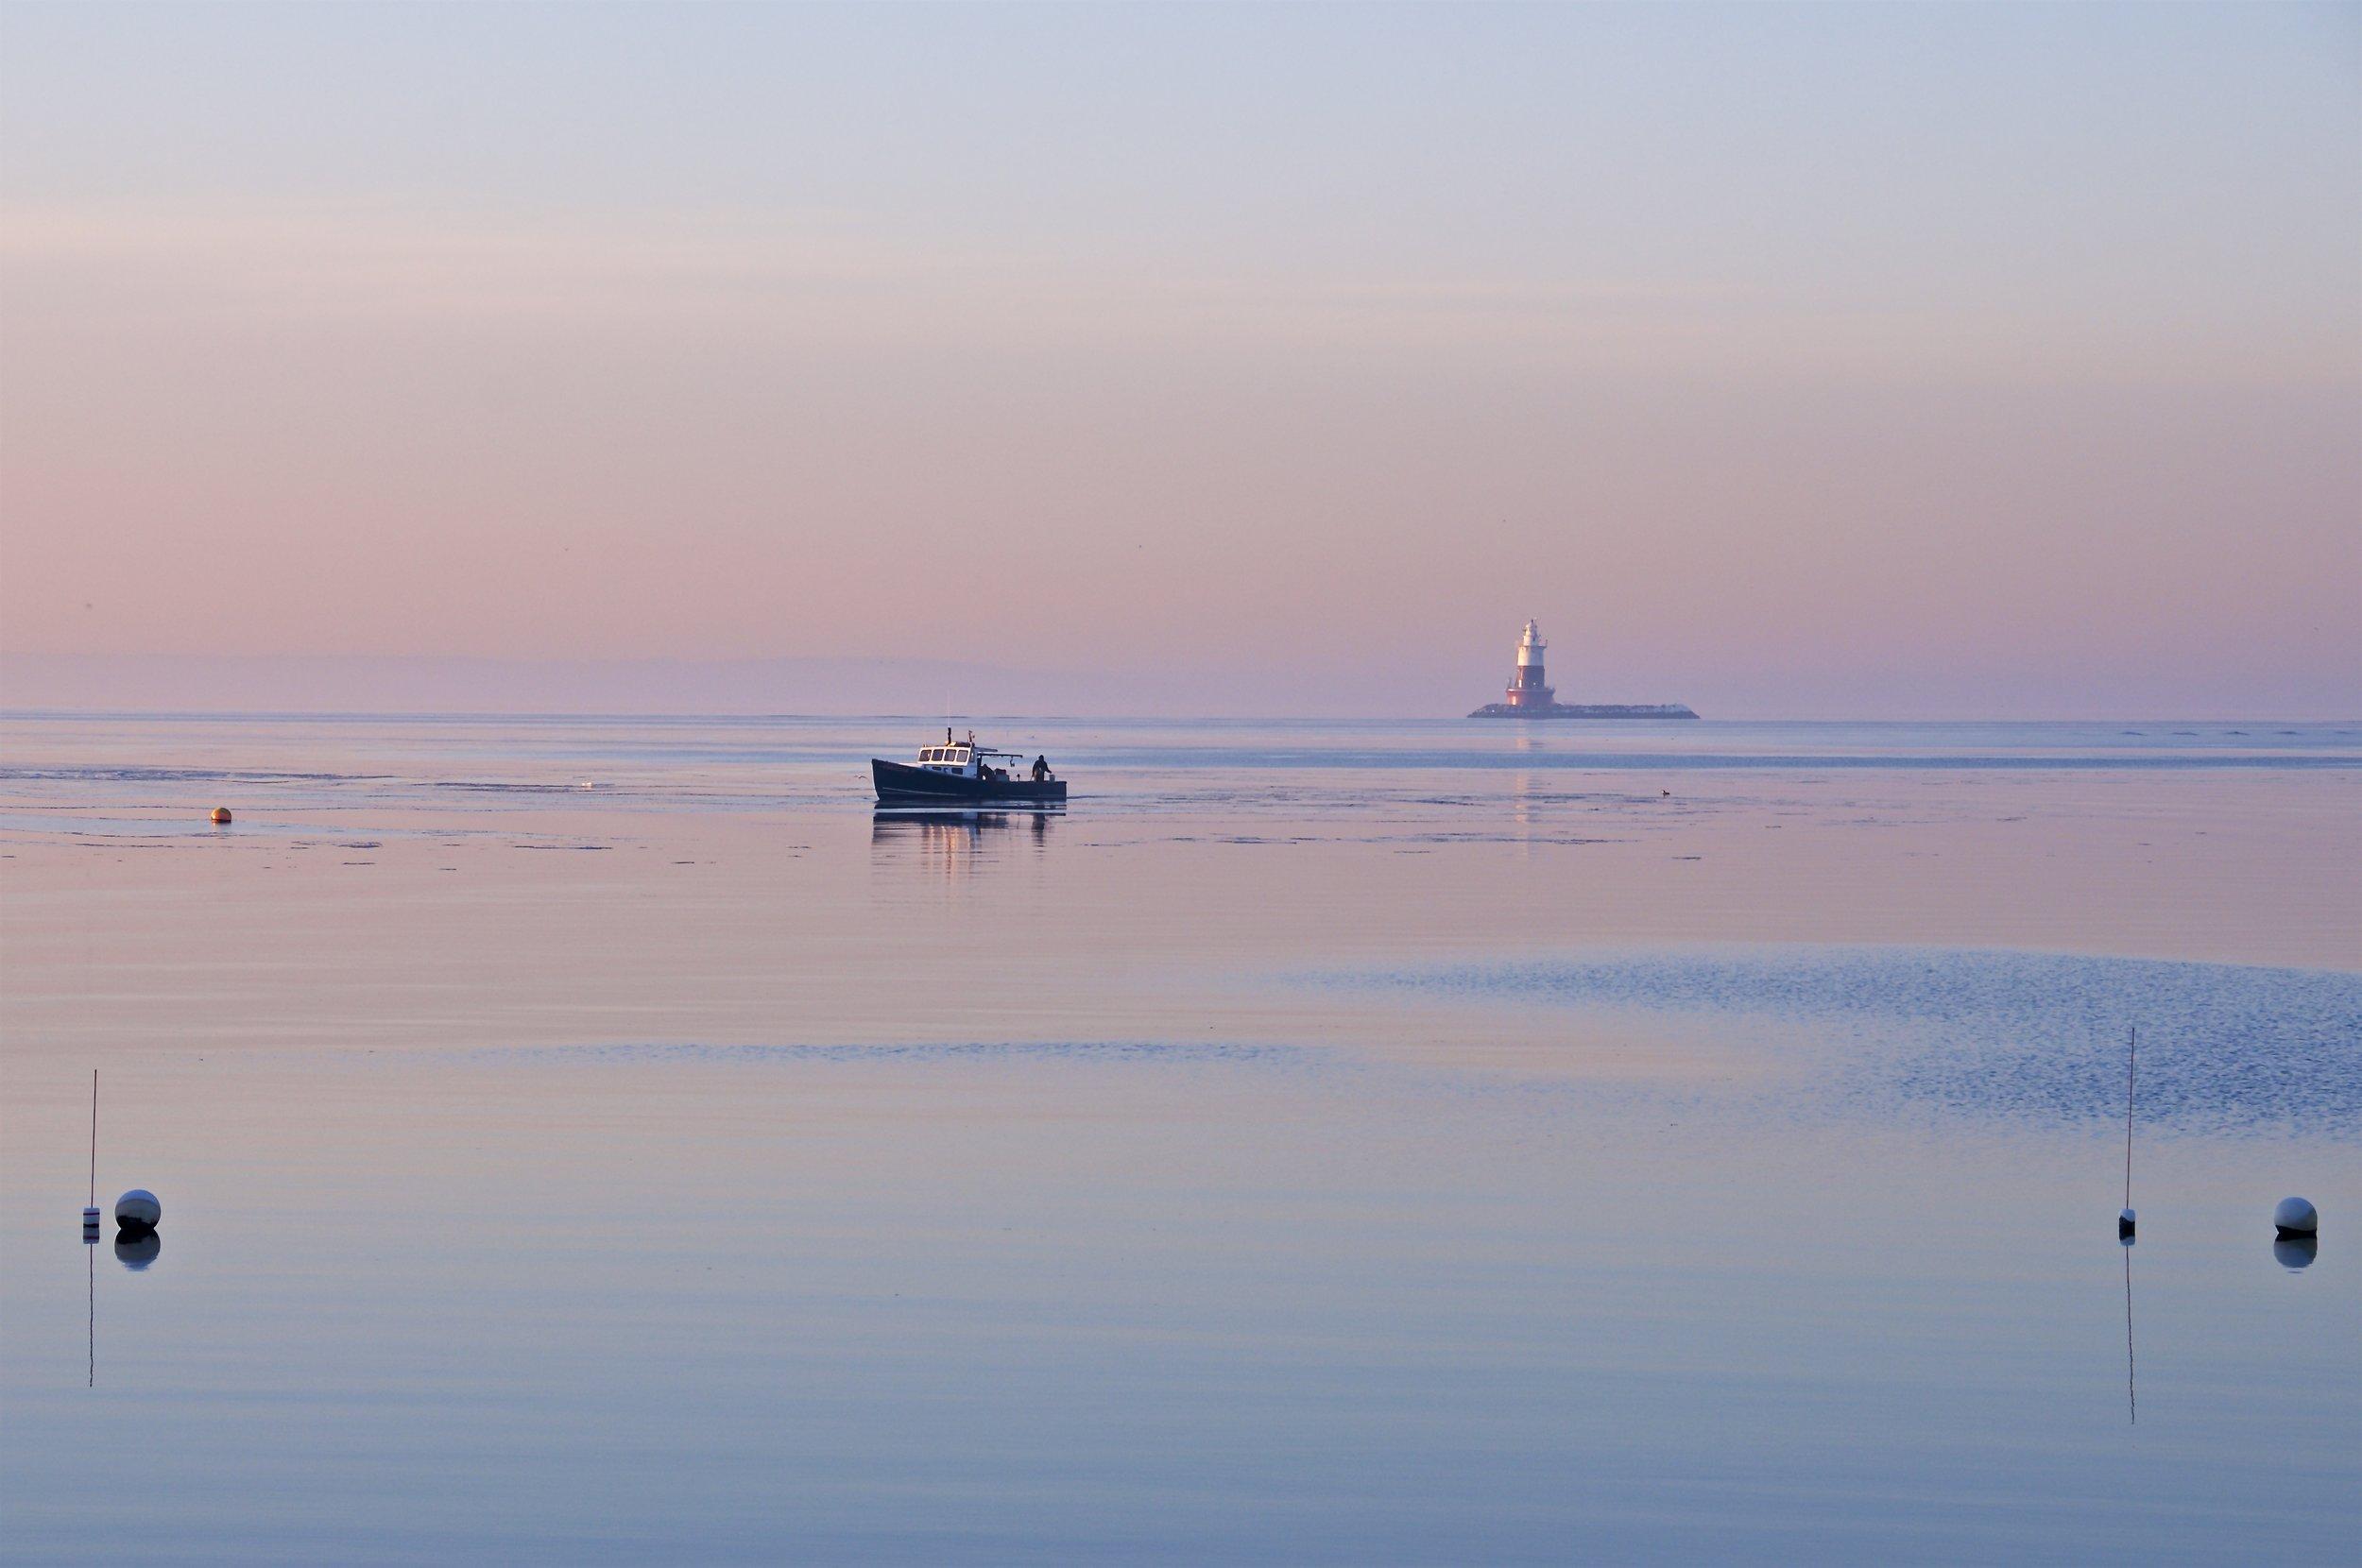 Lobster Boat working Greens' Ledge Lighthouse, Rowayton CT